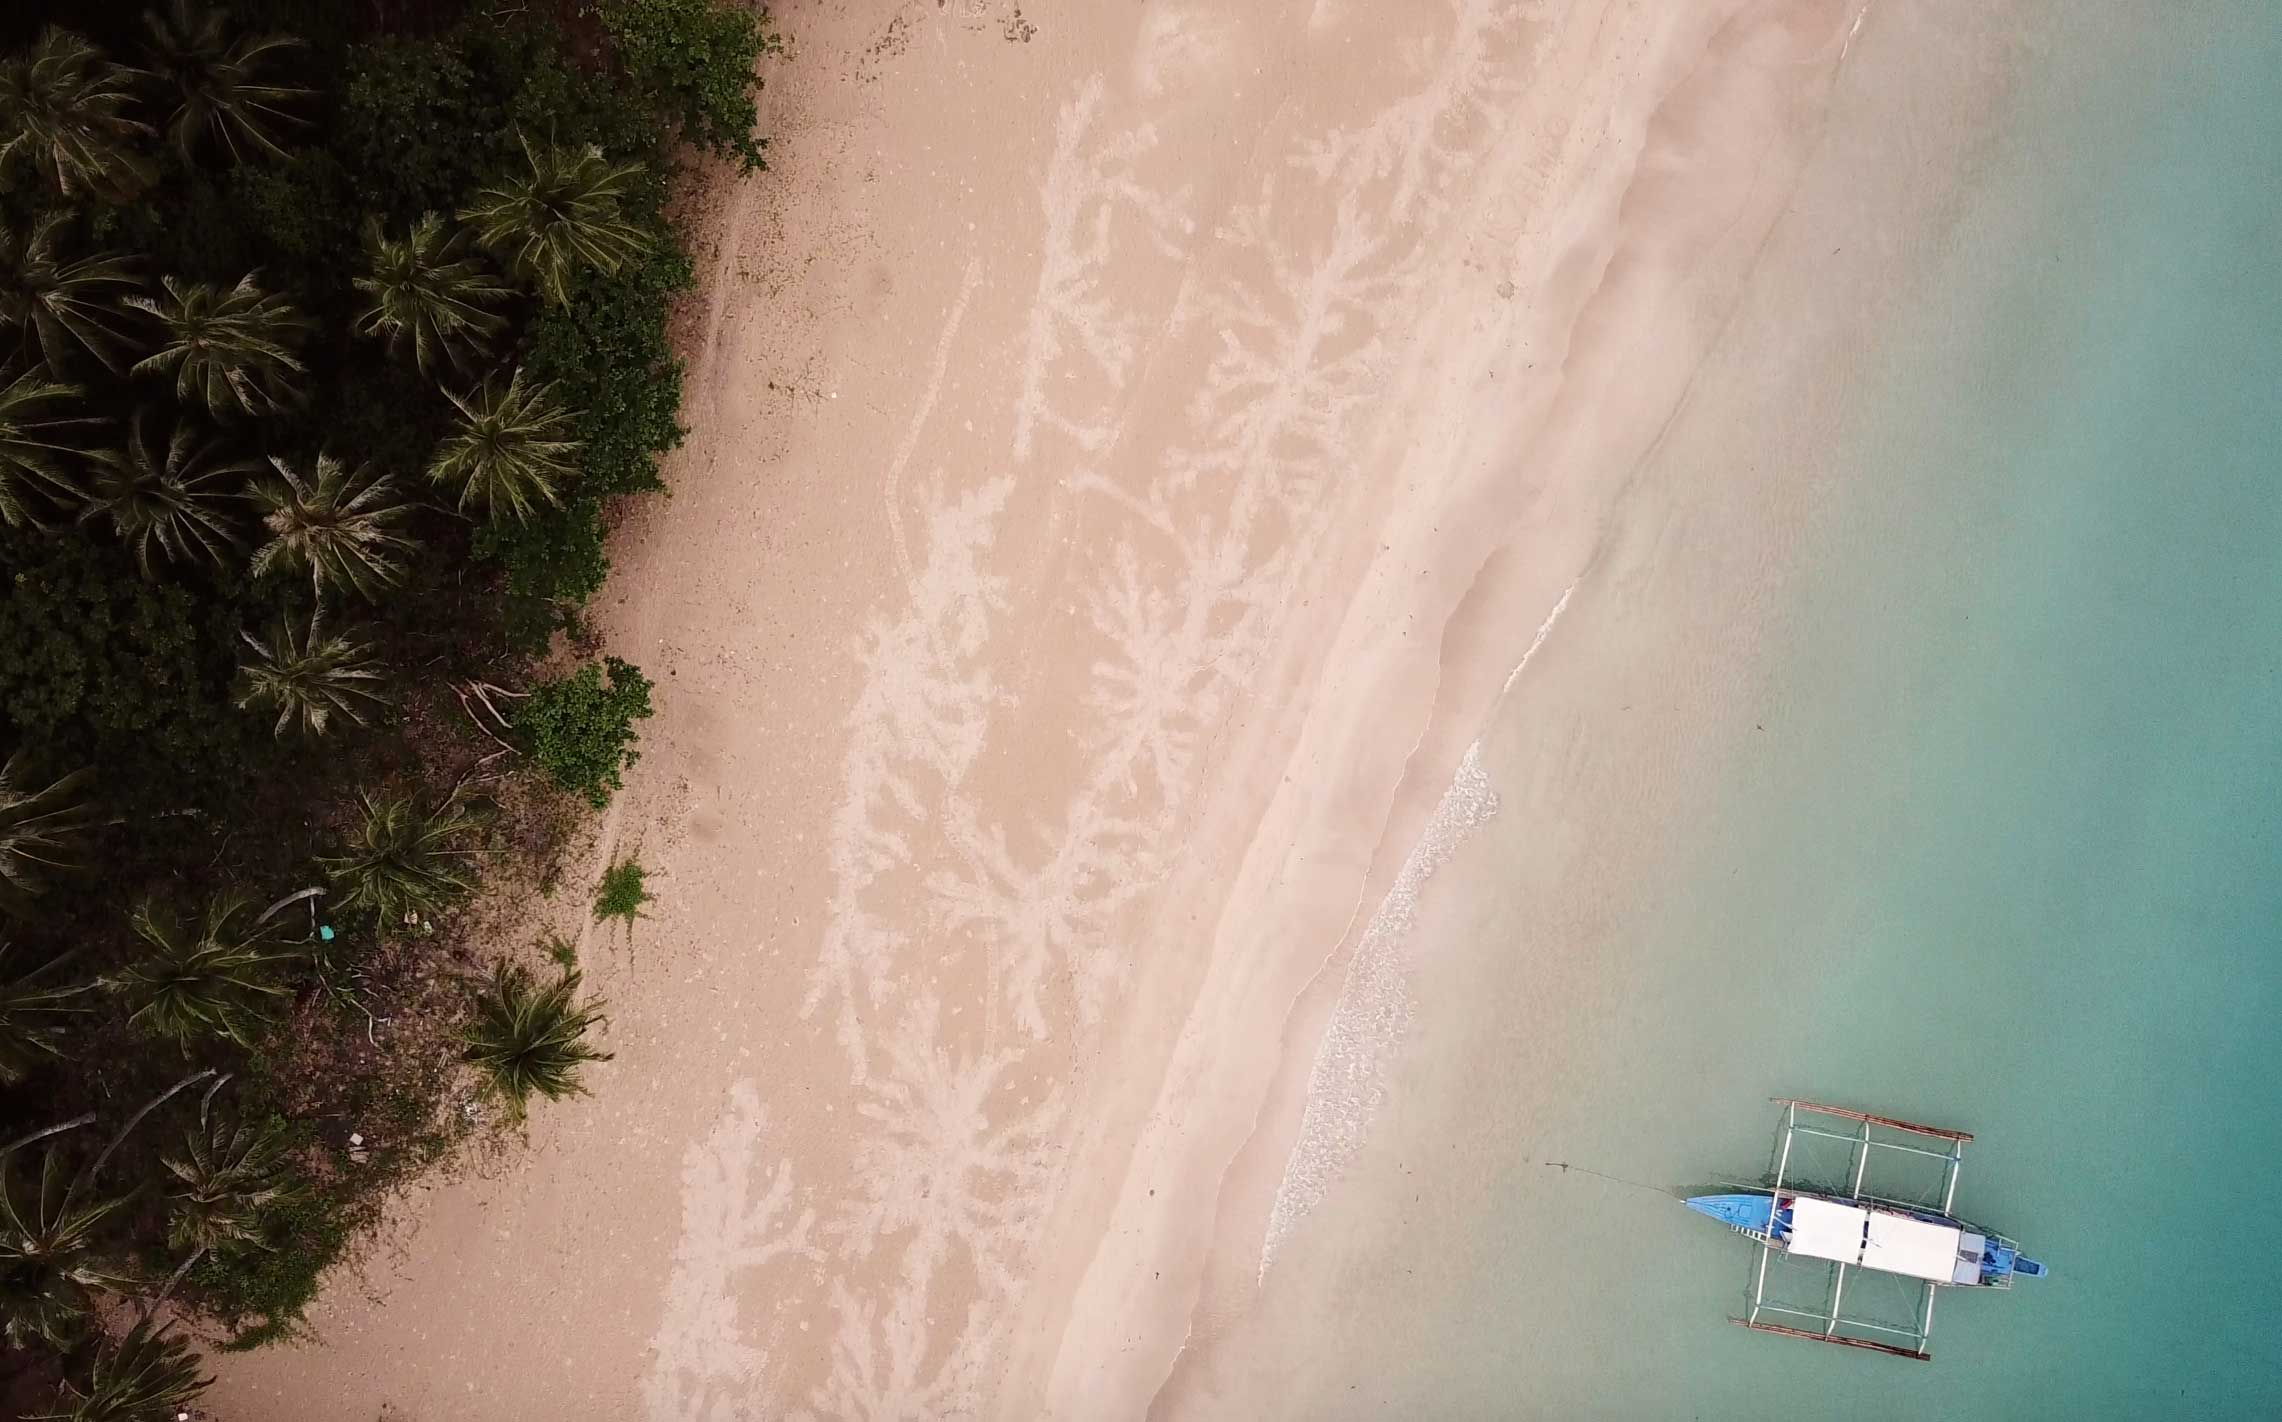 The beautiful, lush beaches of Palawan